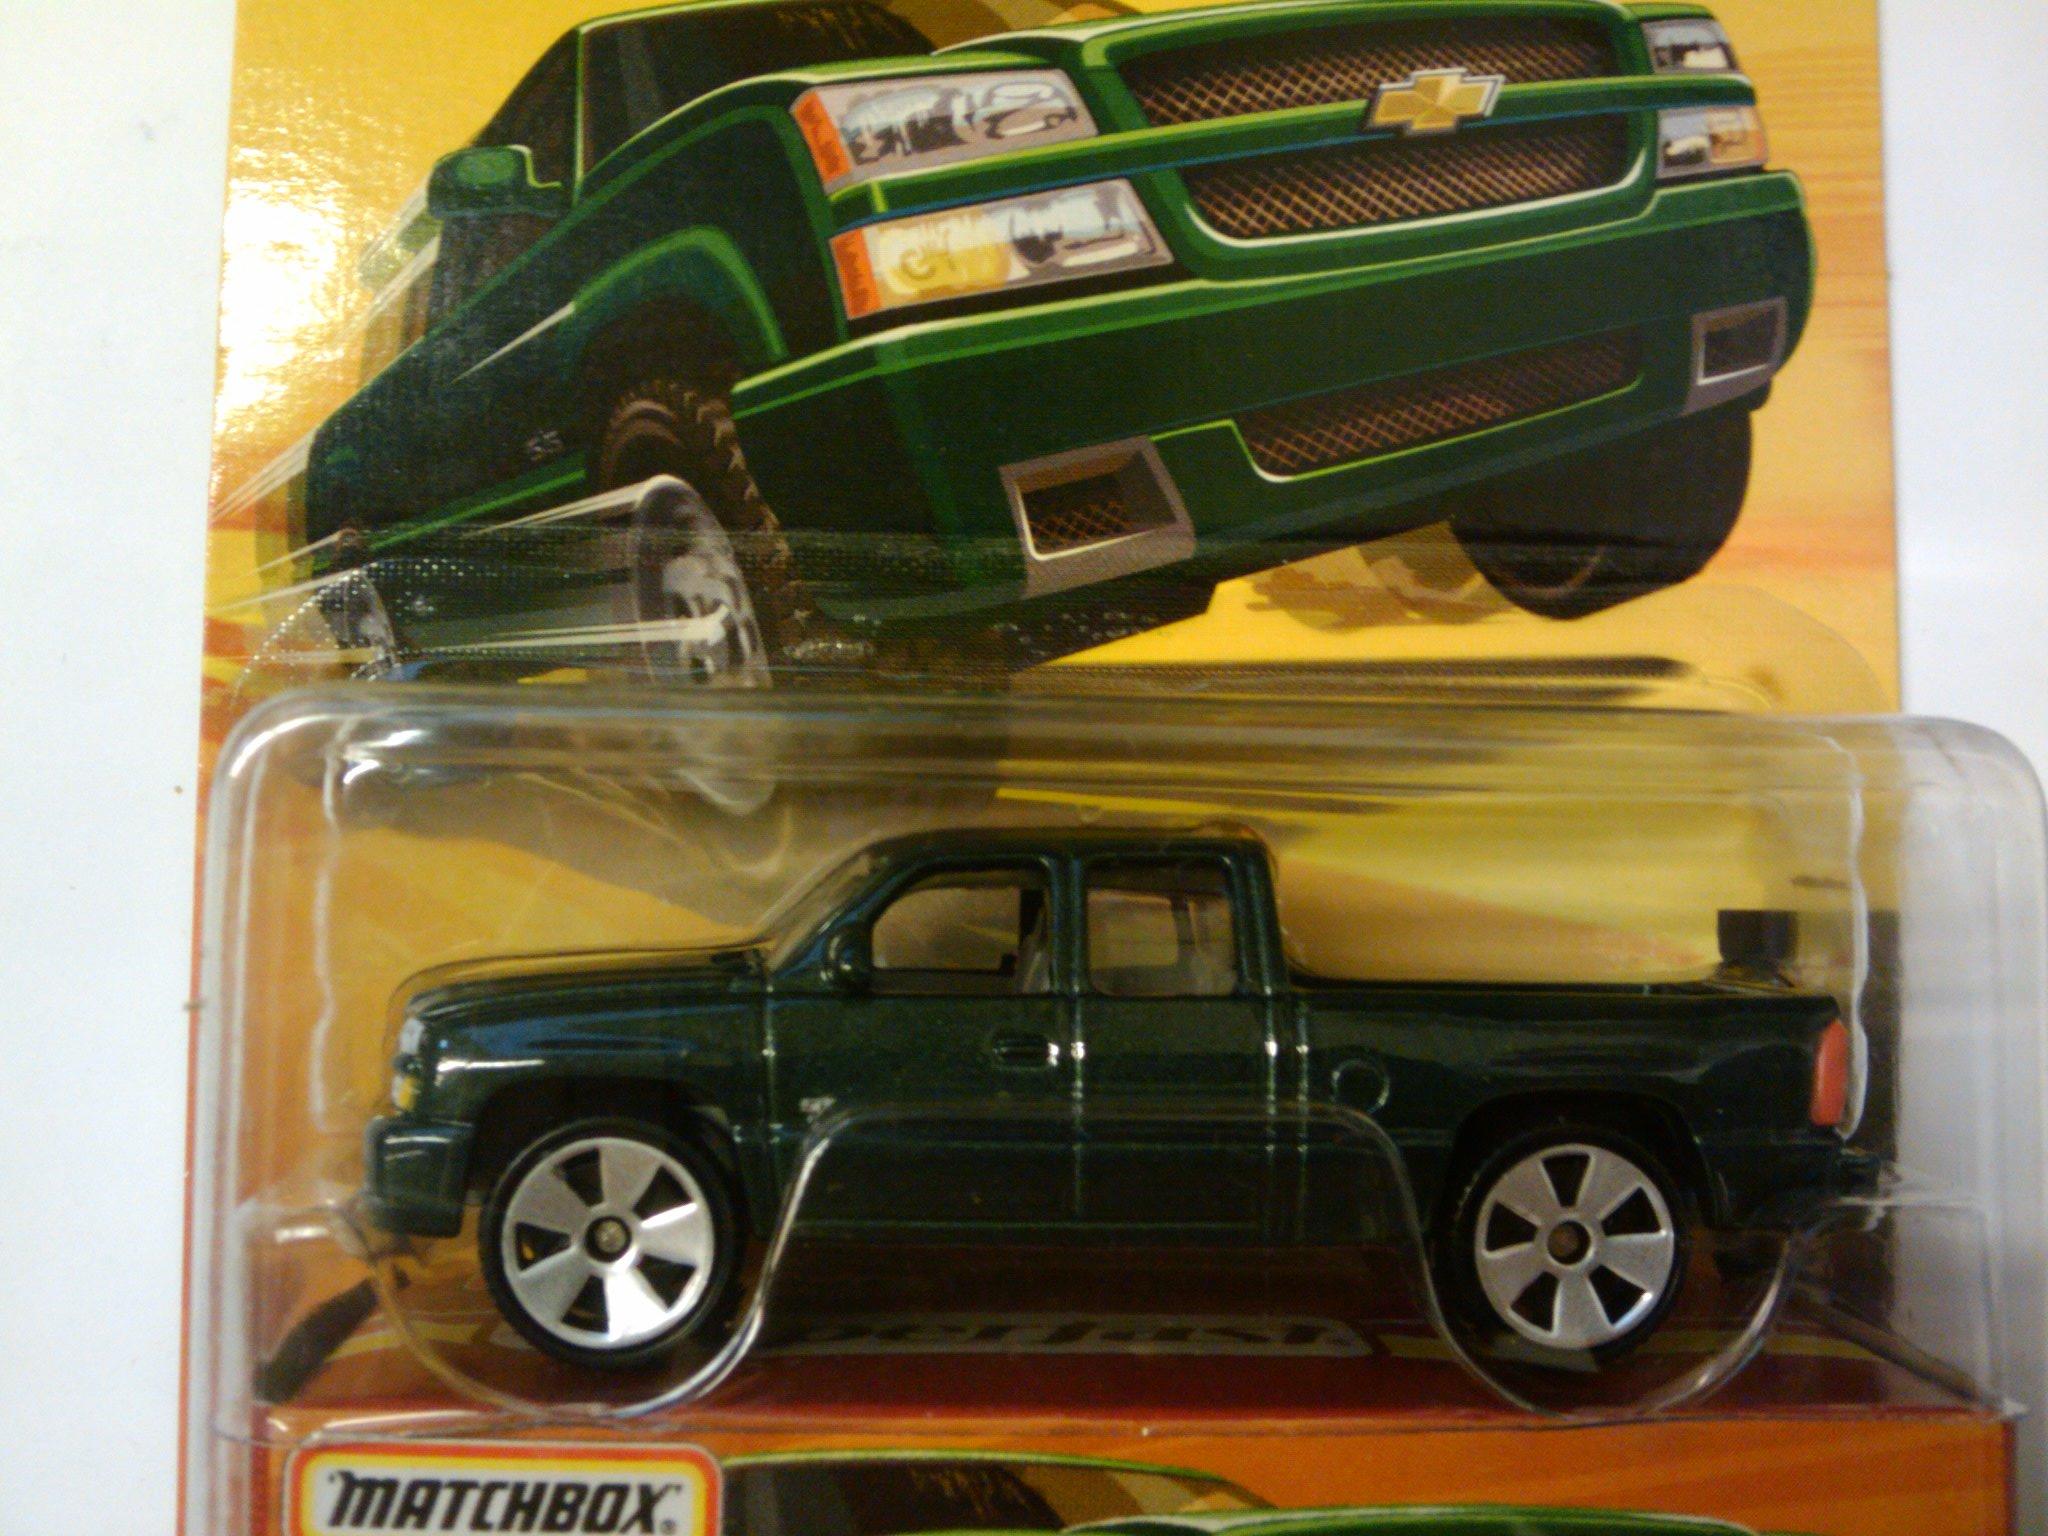 Chevy Silverado - Matchbox Cars Wiki